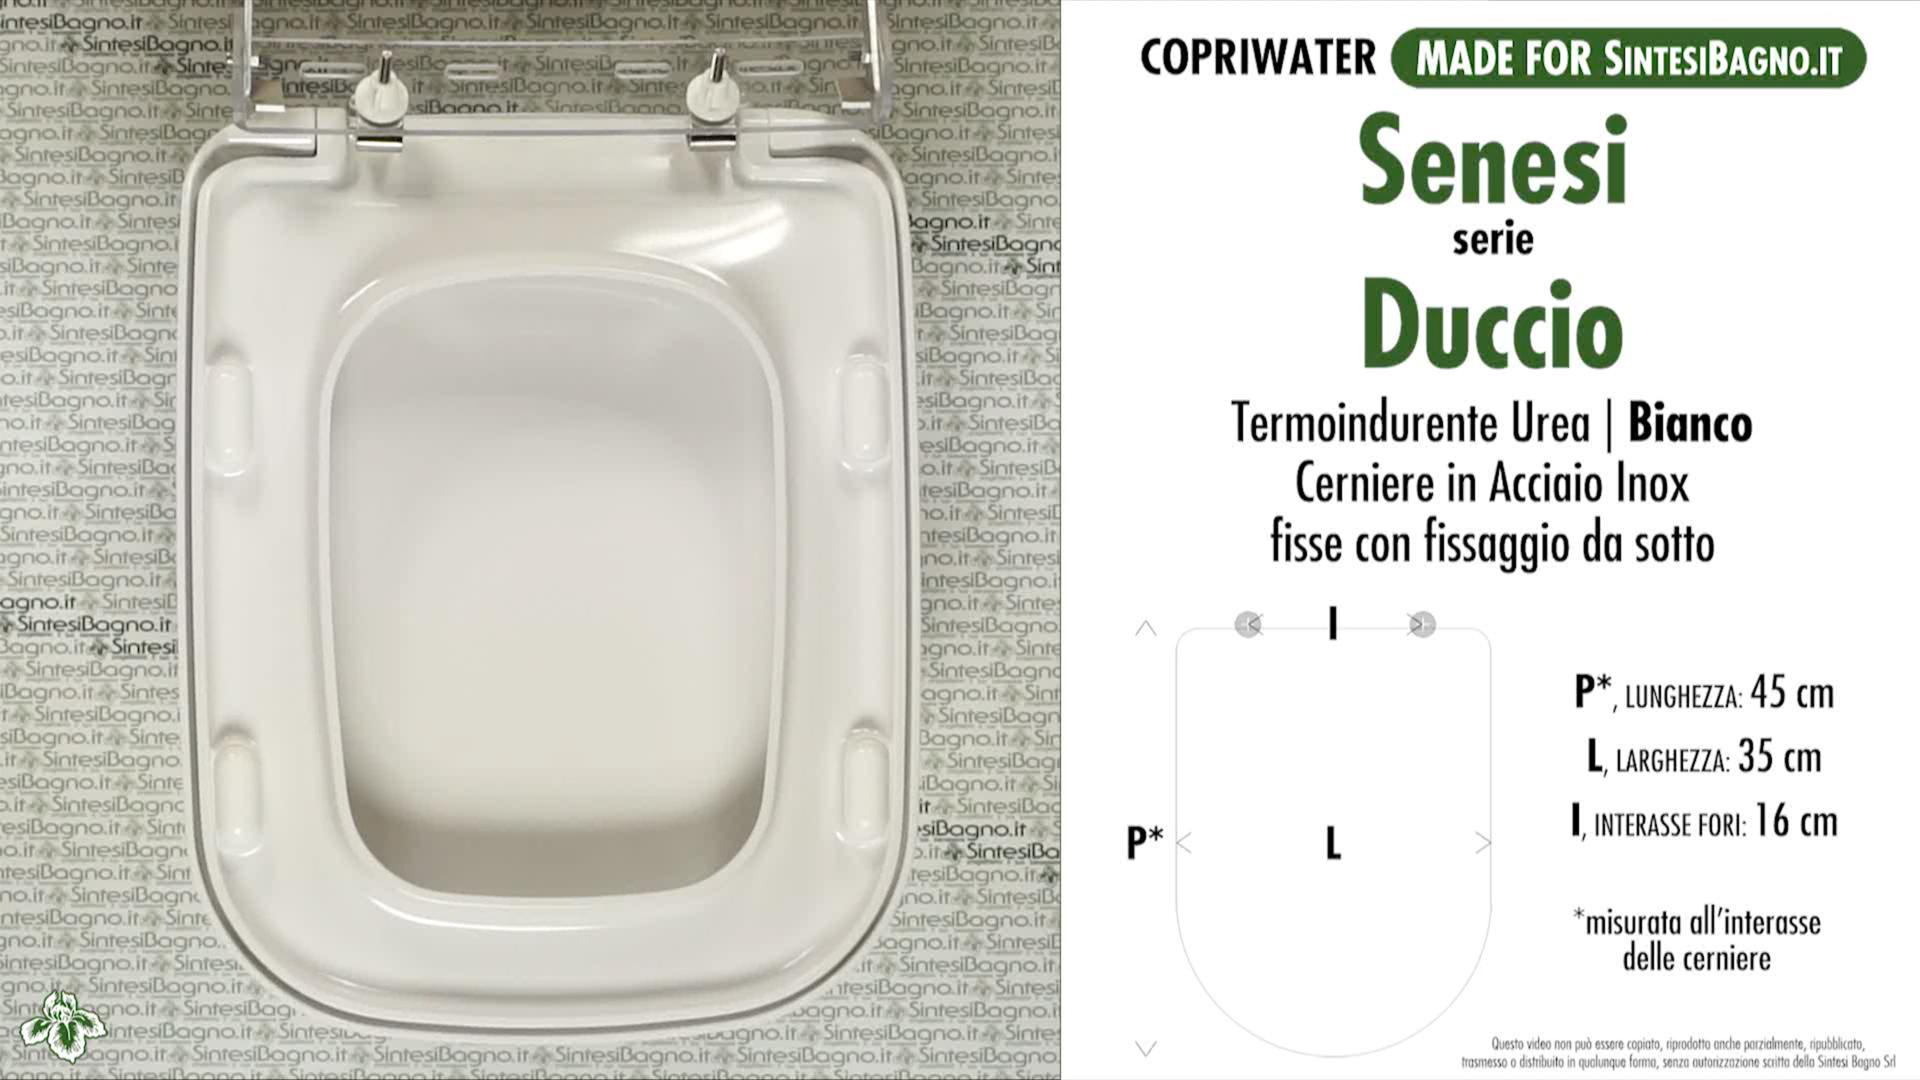 scheda-tecnica-datasheet-copriwater-senesi-serie-duccio